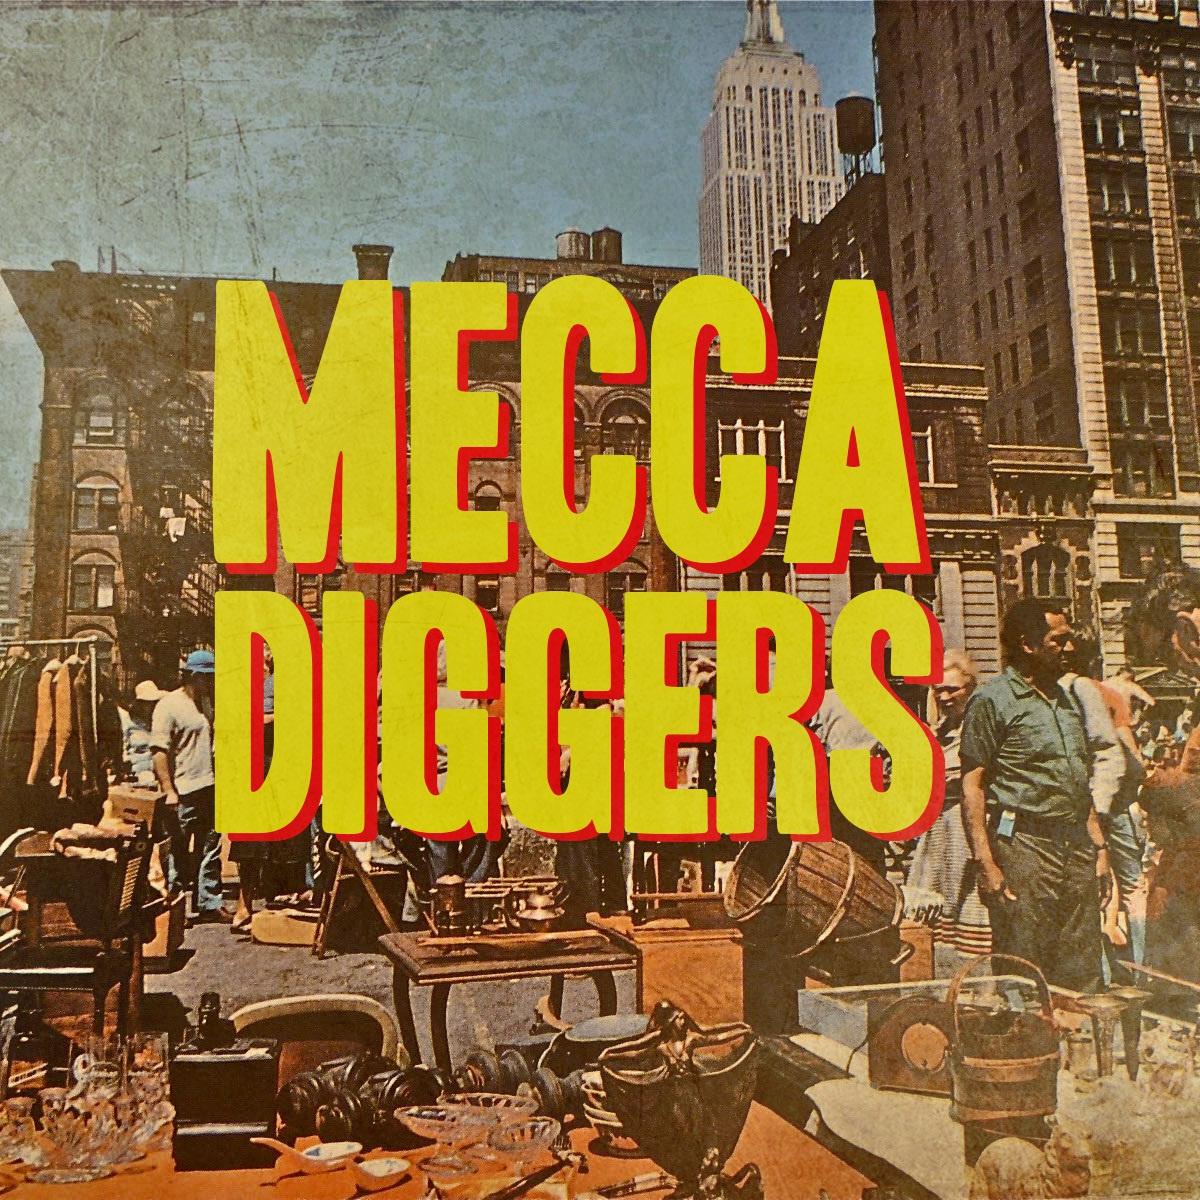 Rough_records_presenta_mecca_diggers